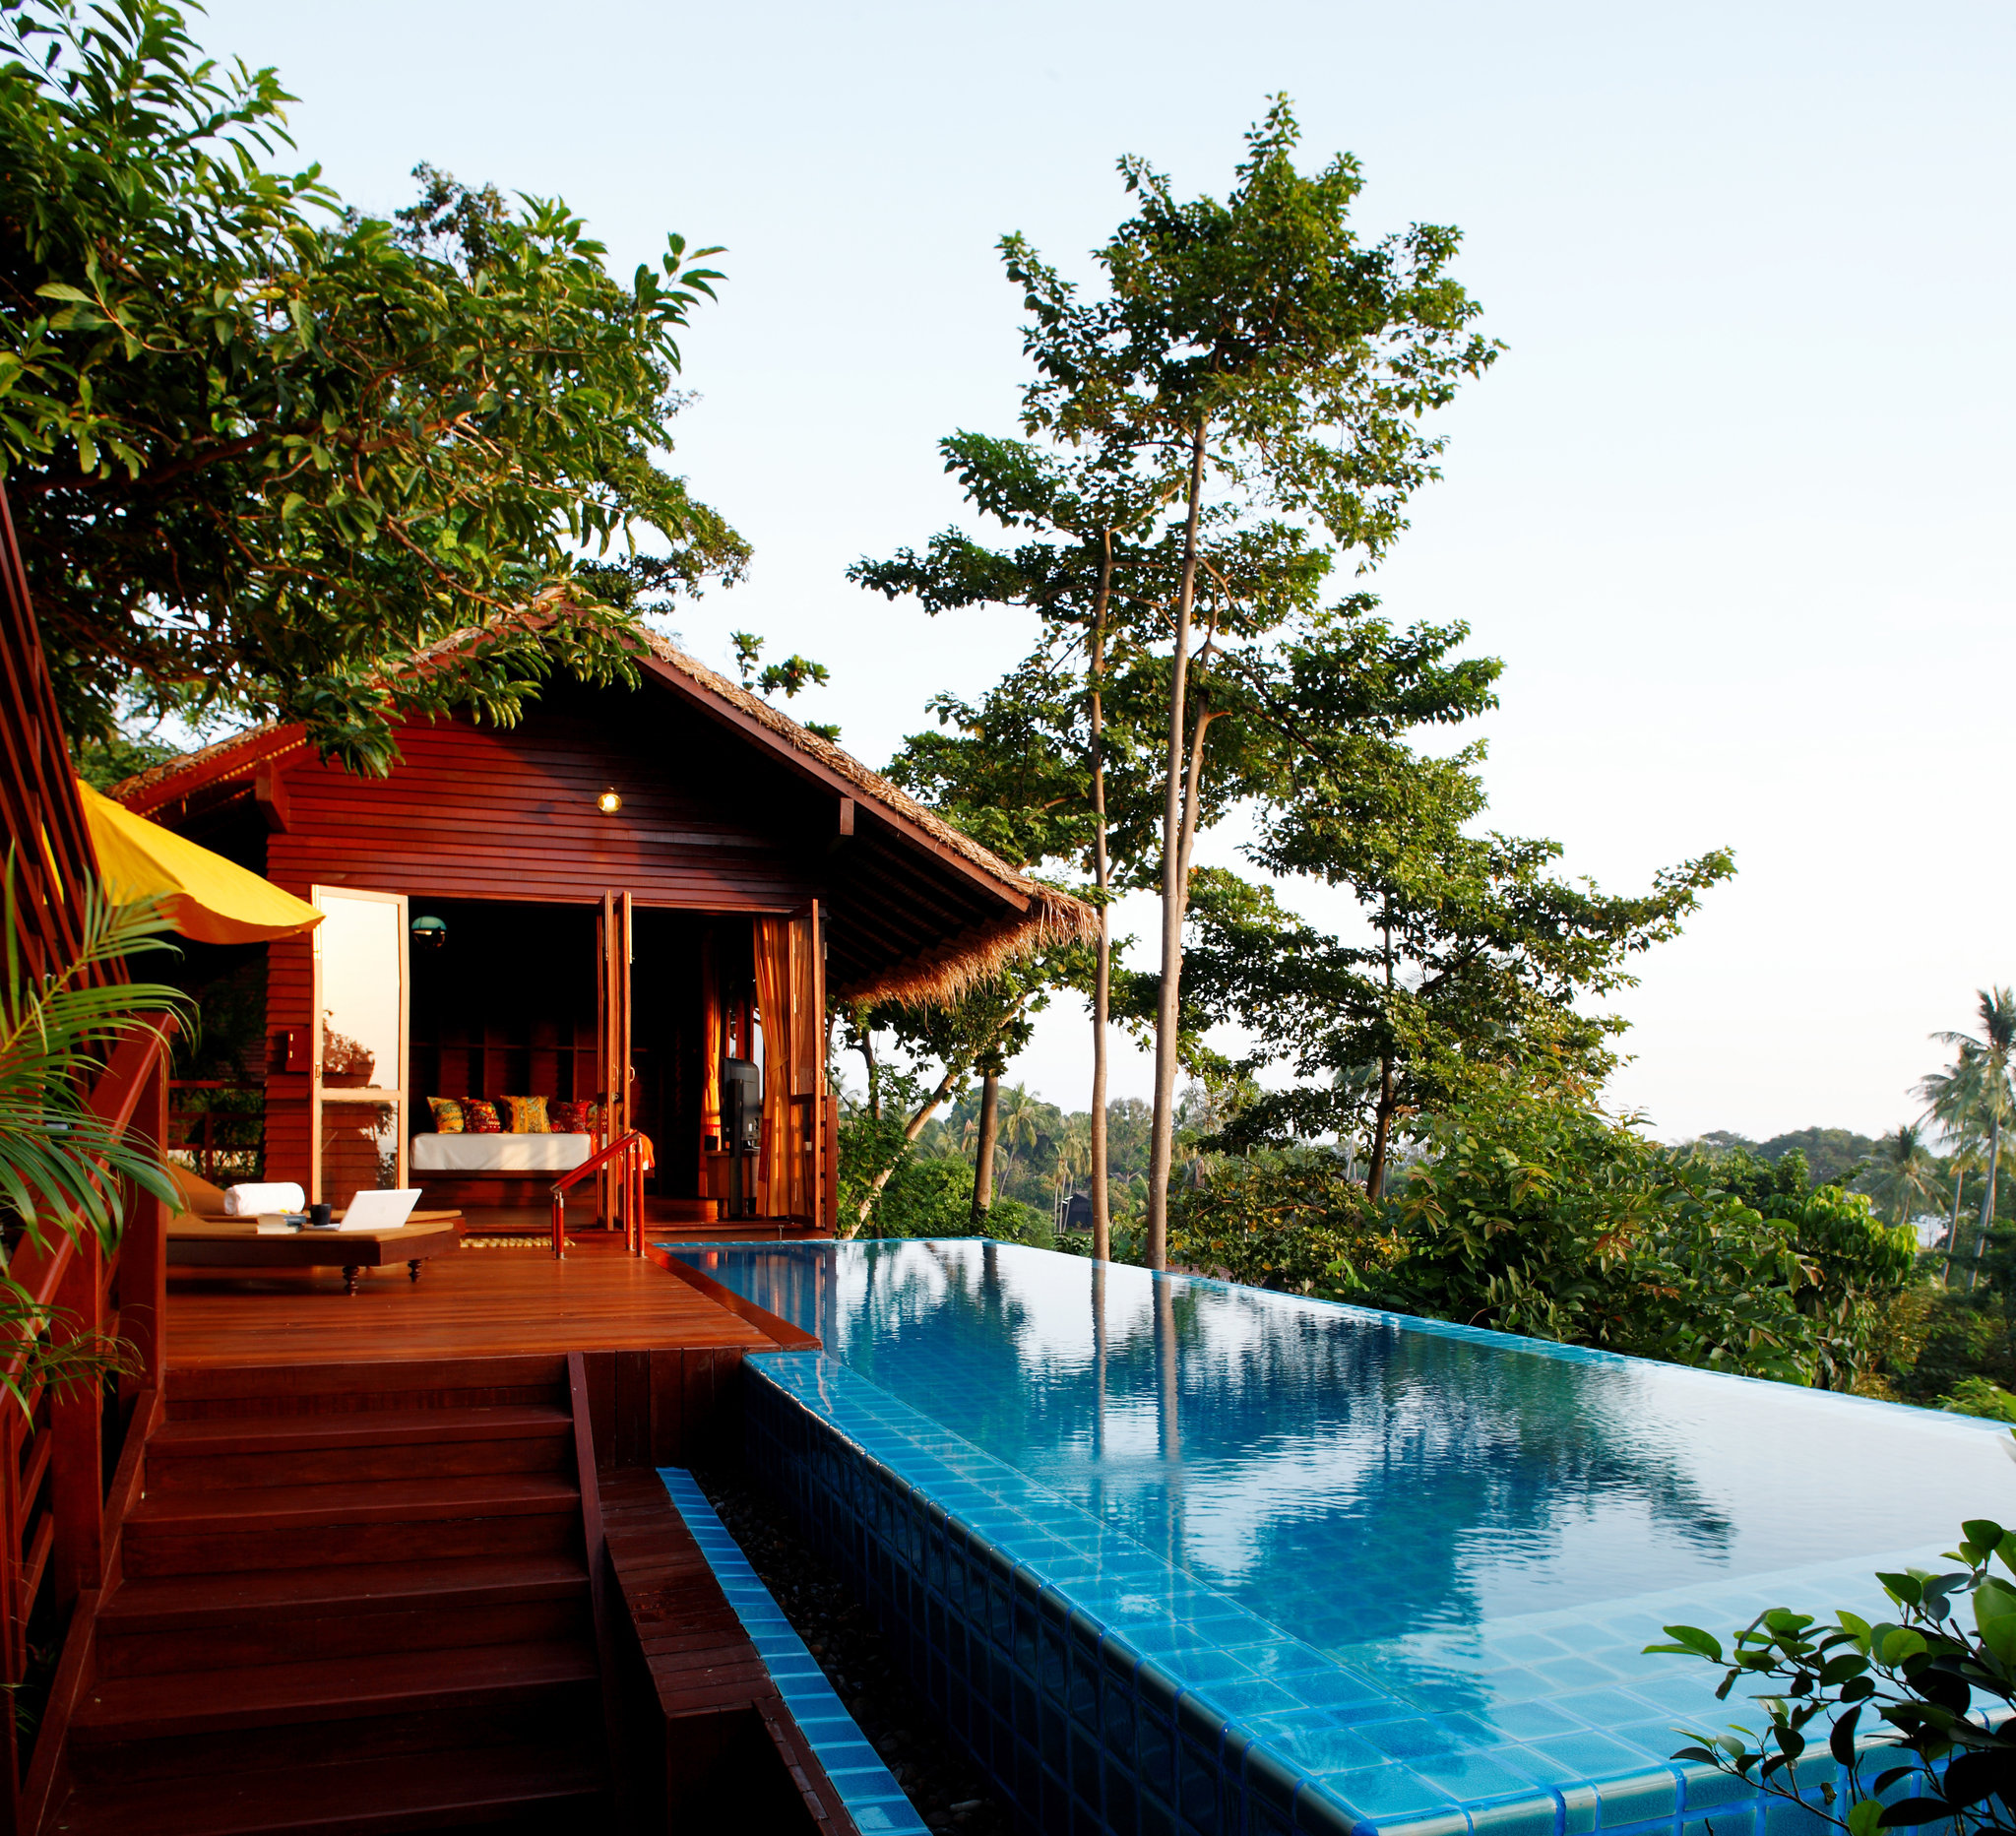 Zeavola Luxury Hotel Koh Phi Phi Thailand Slh